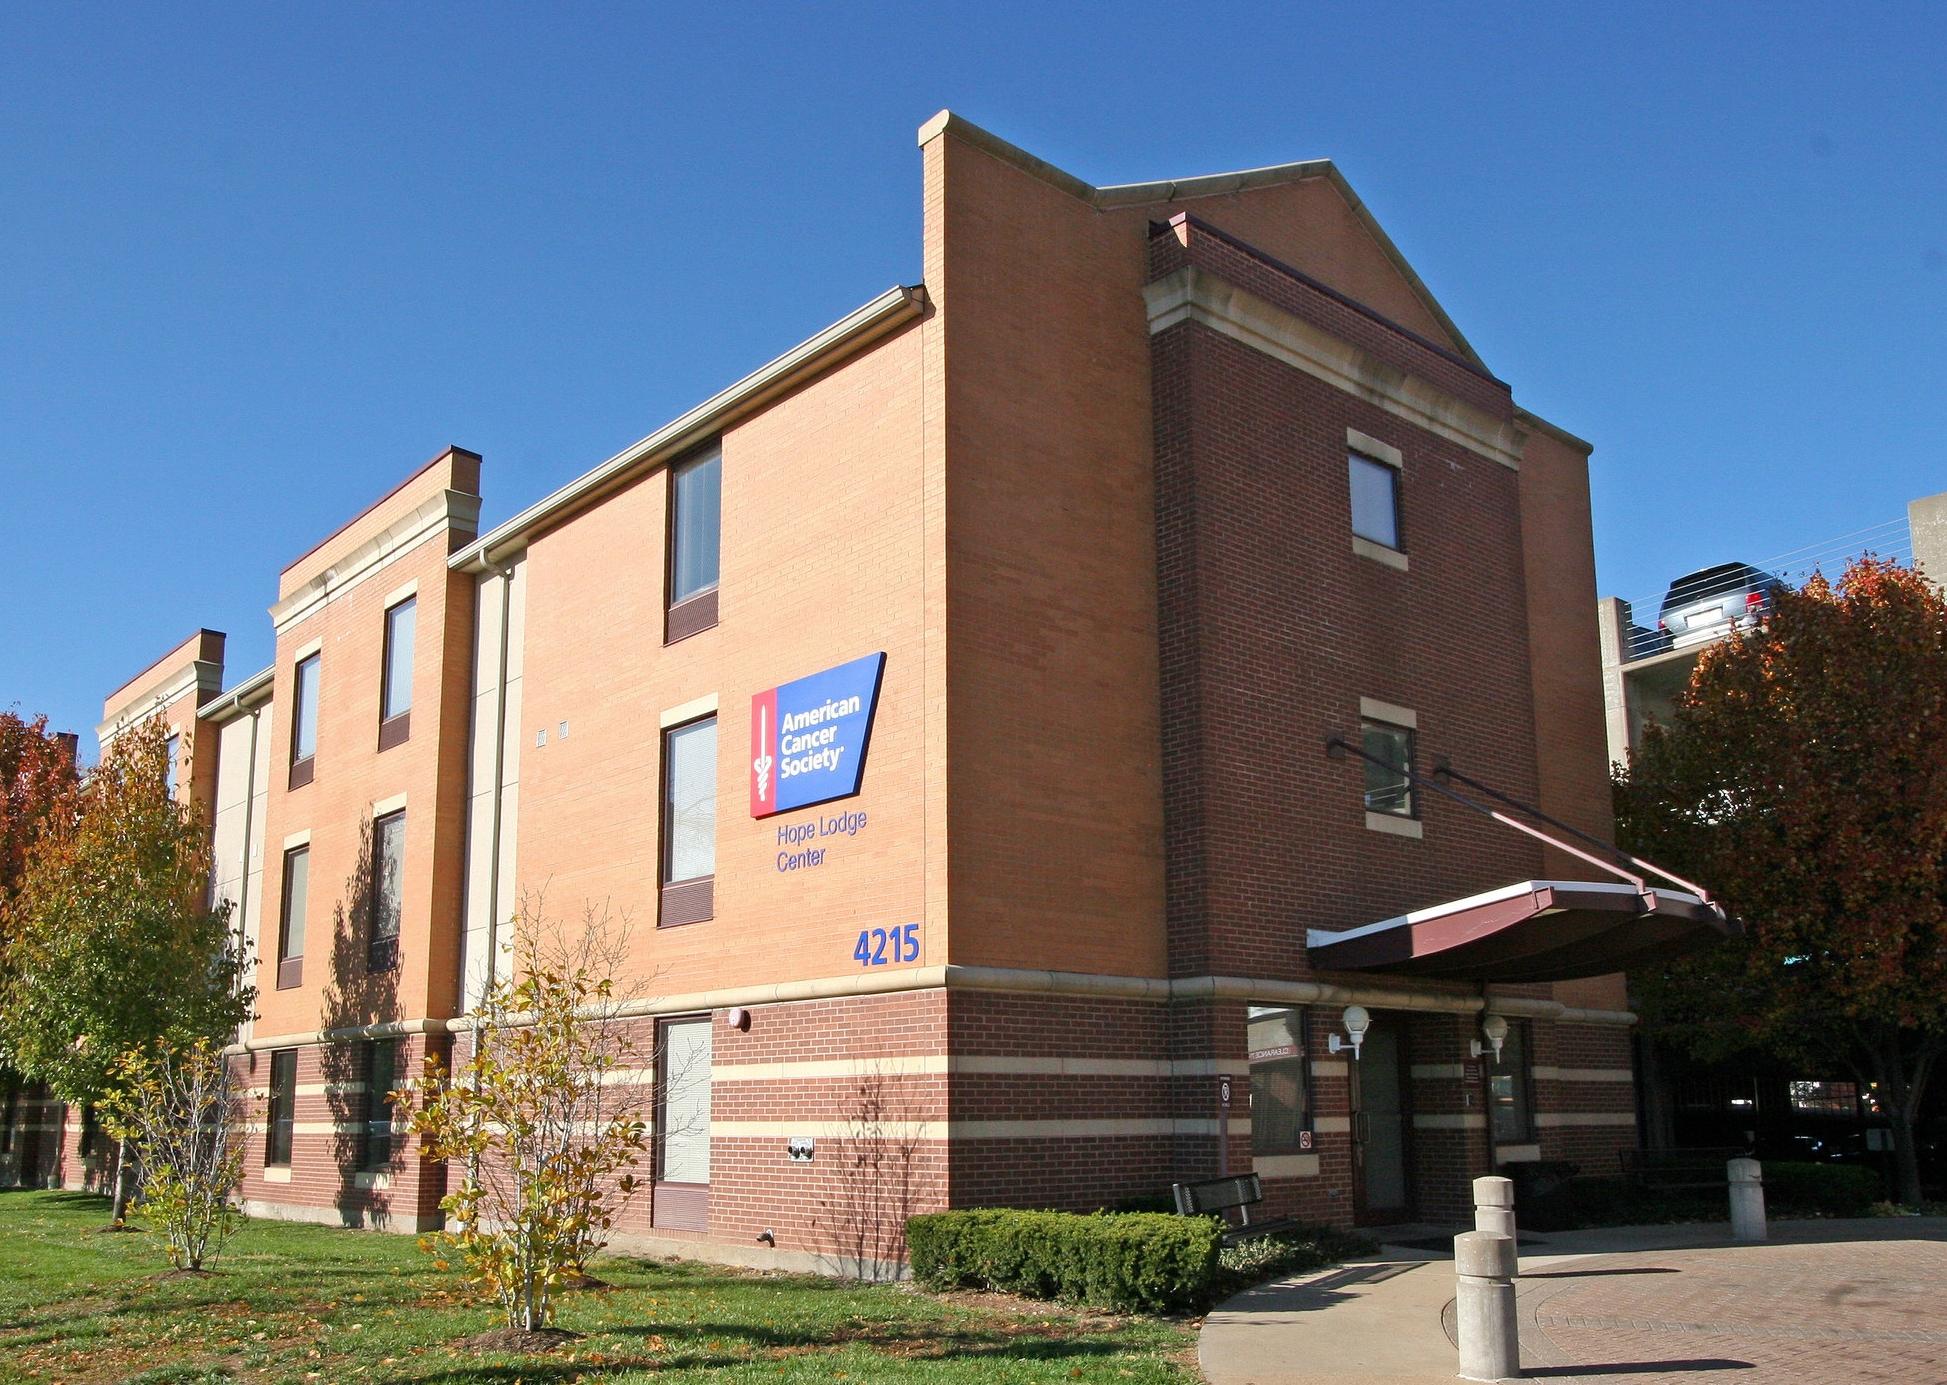 ACS Hope Lodge St. Louis